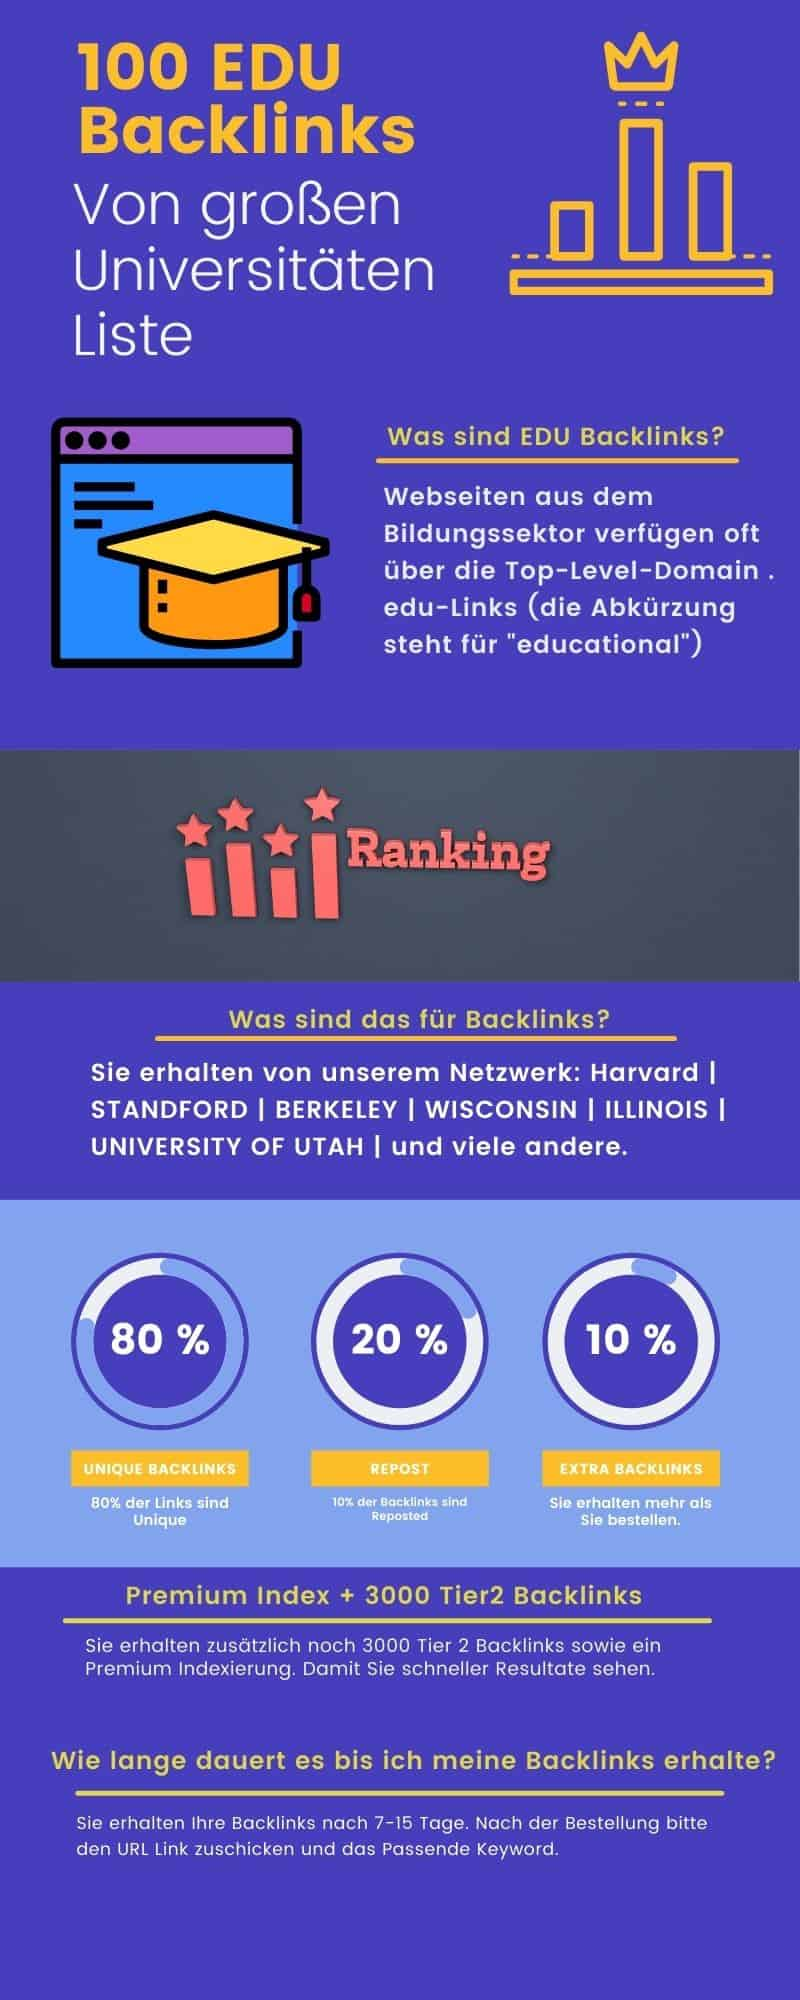 100 EDU Backlinks universitäten